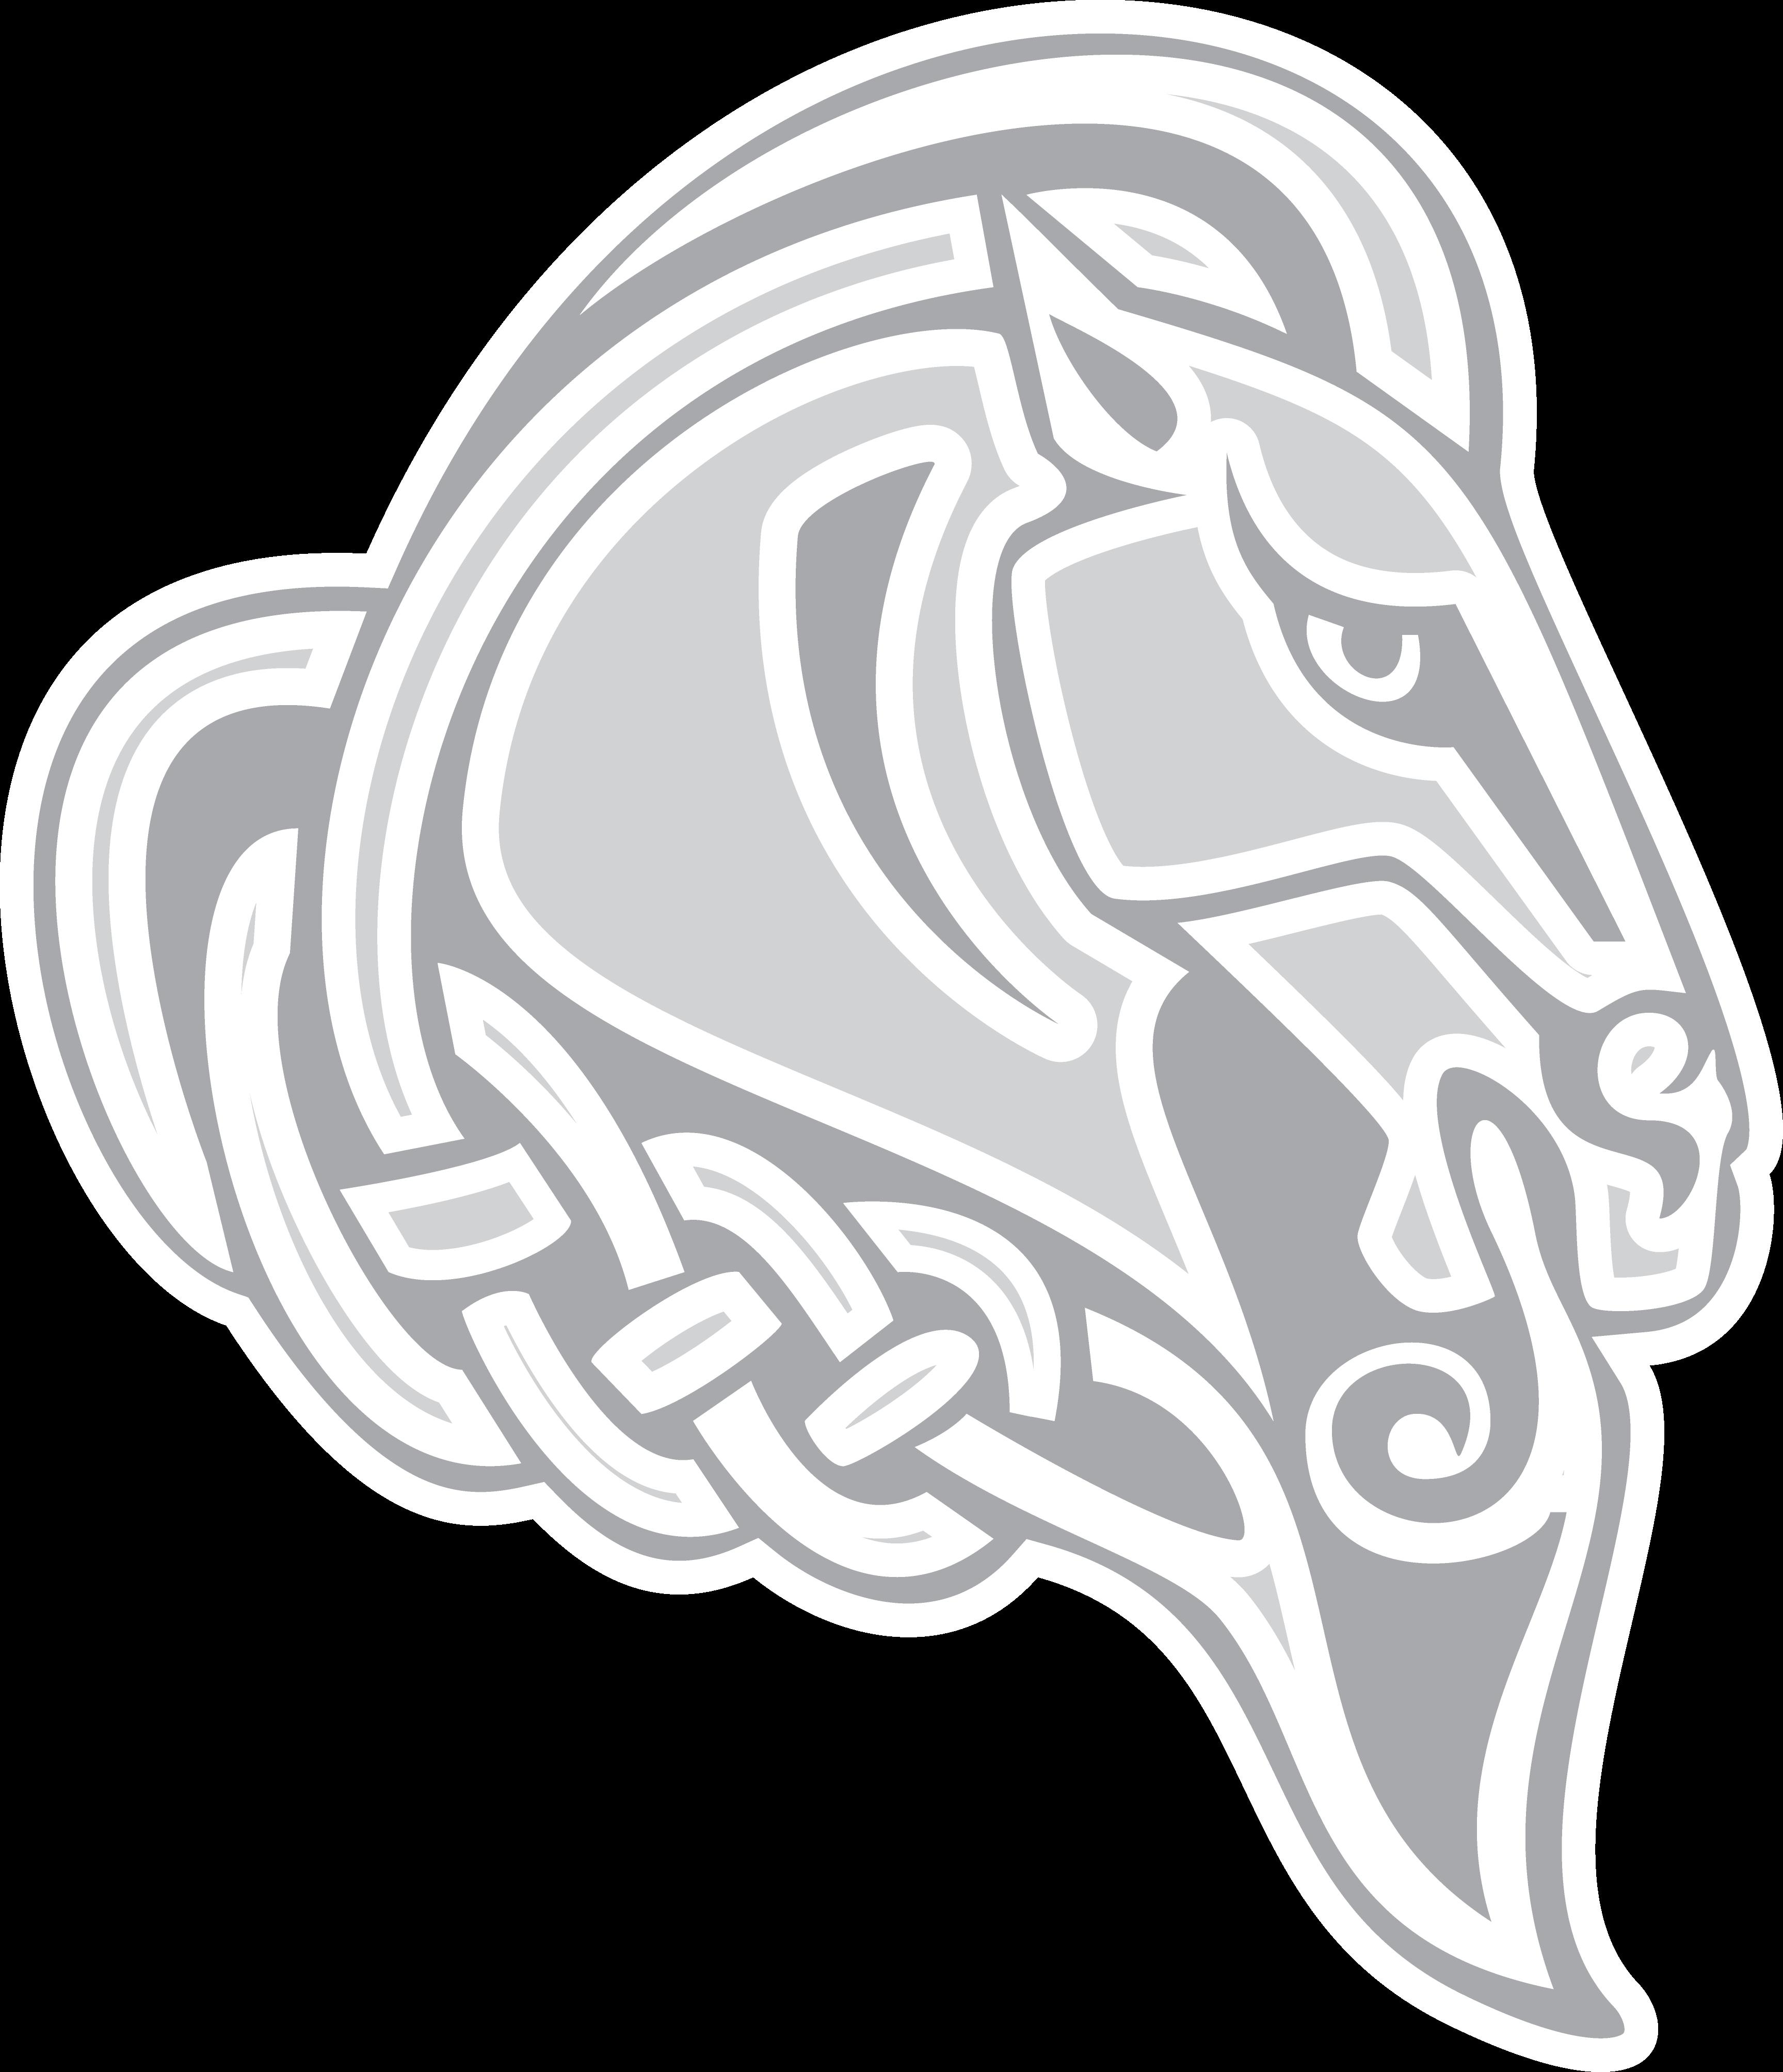 . ClipartLook.com The Elder Scrolls V Skyrim Whiterun Symbol by Titch-IX